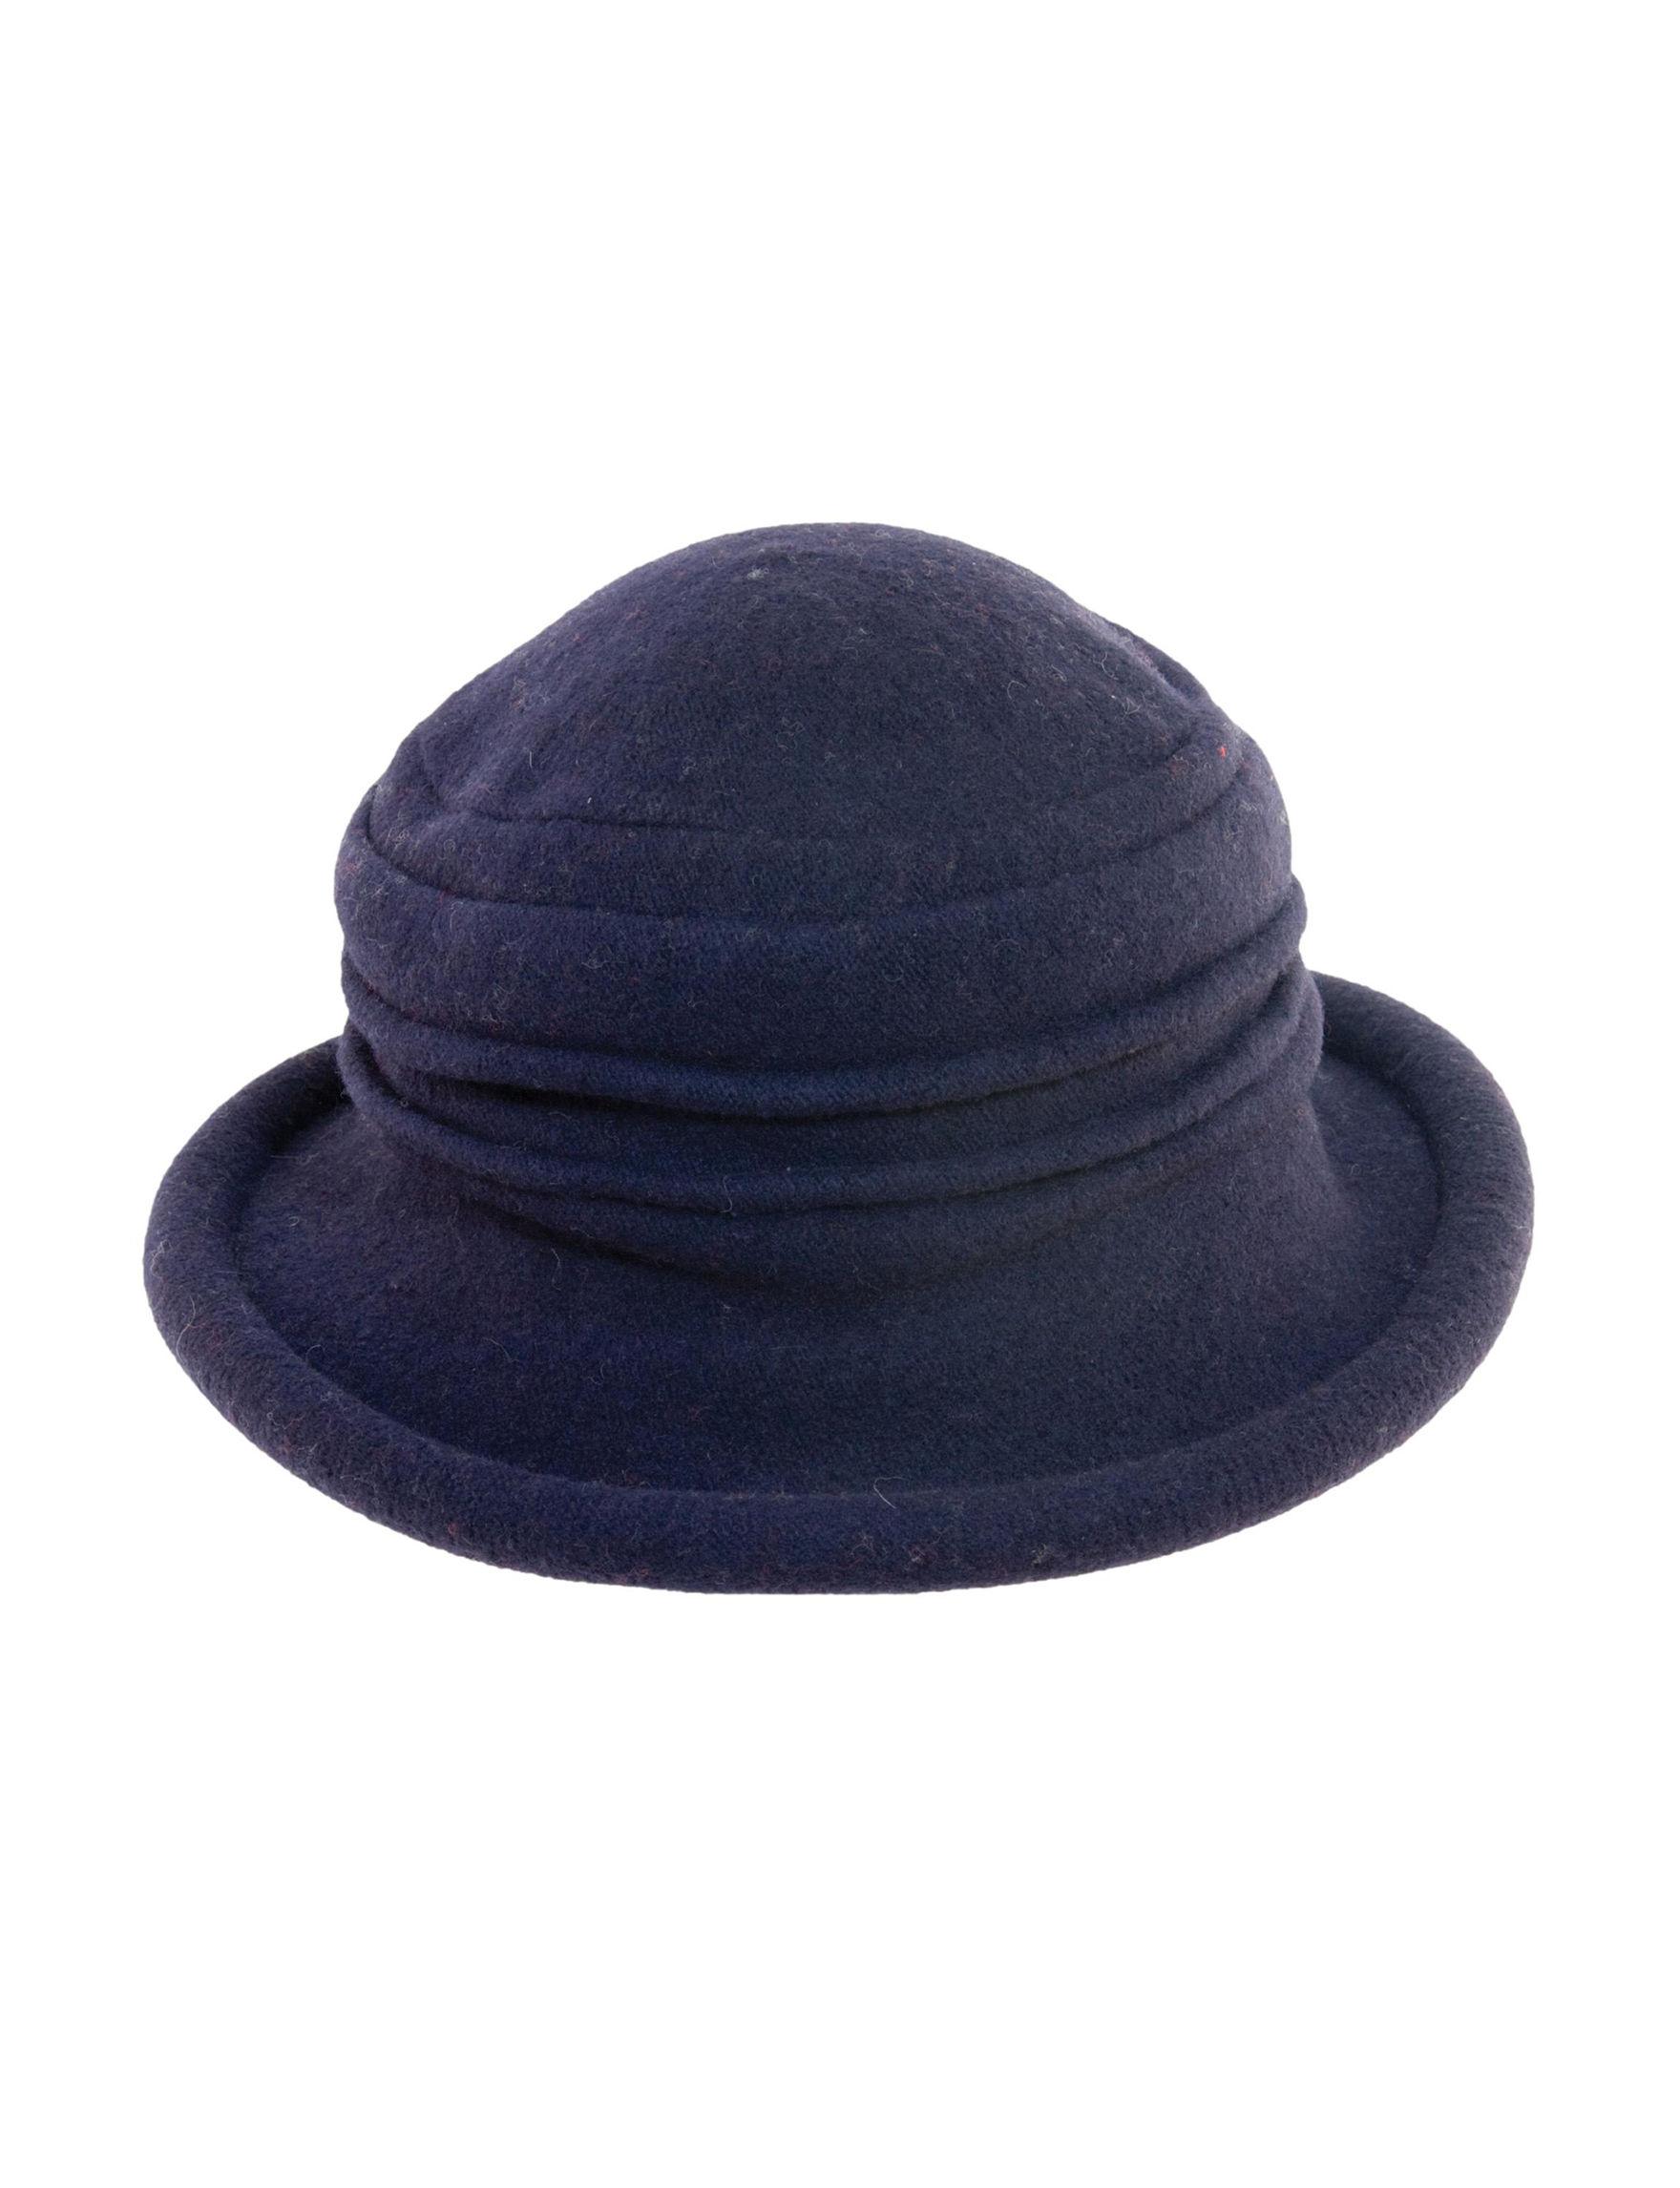 Scala Navy Hats & Headwear